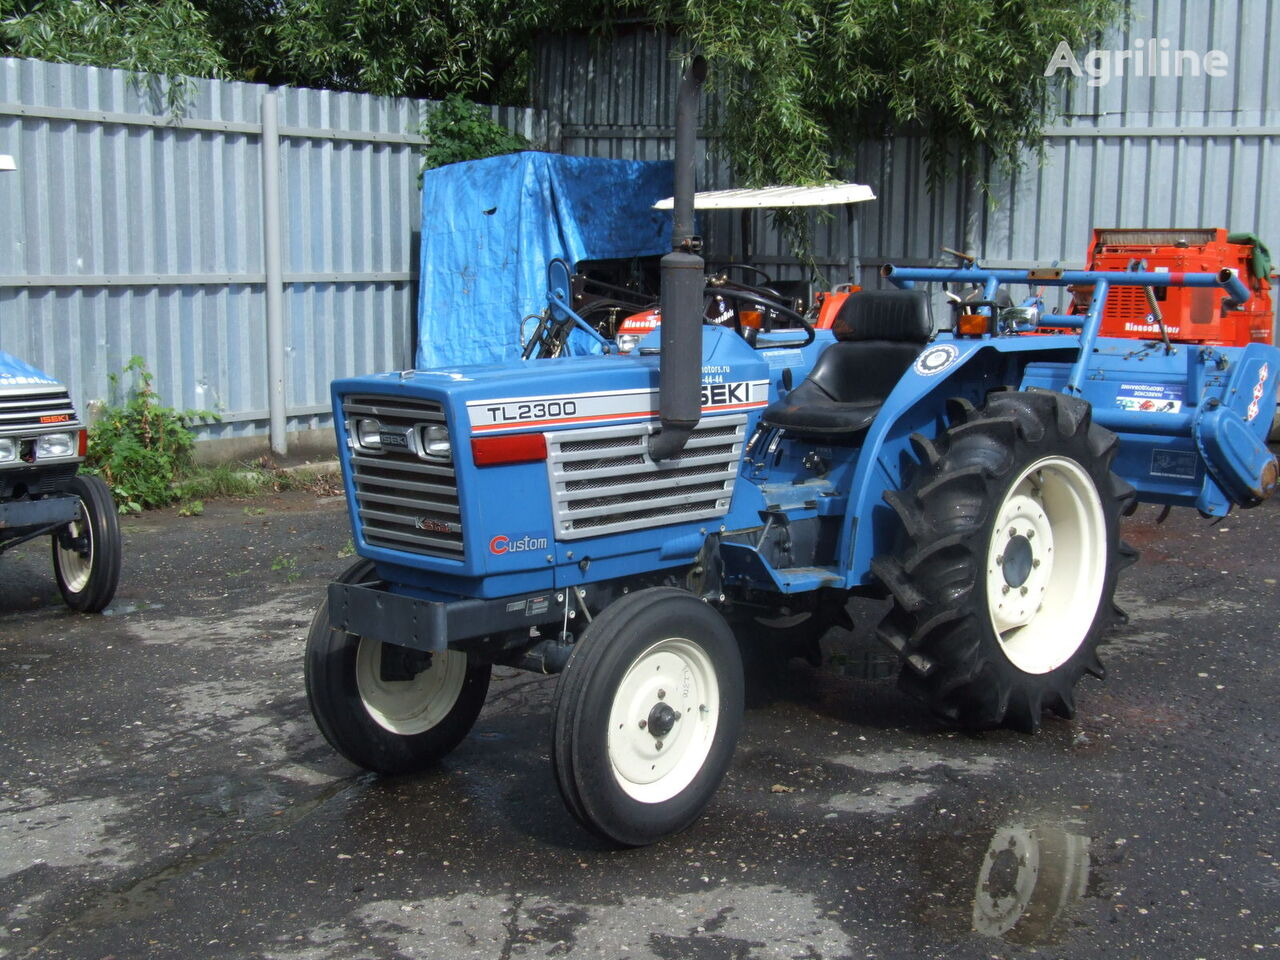 ISEKI TL2300S mini tractor